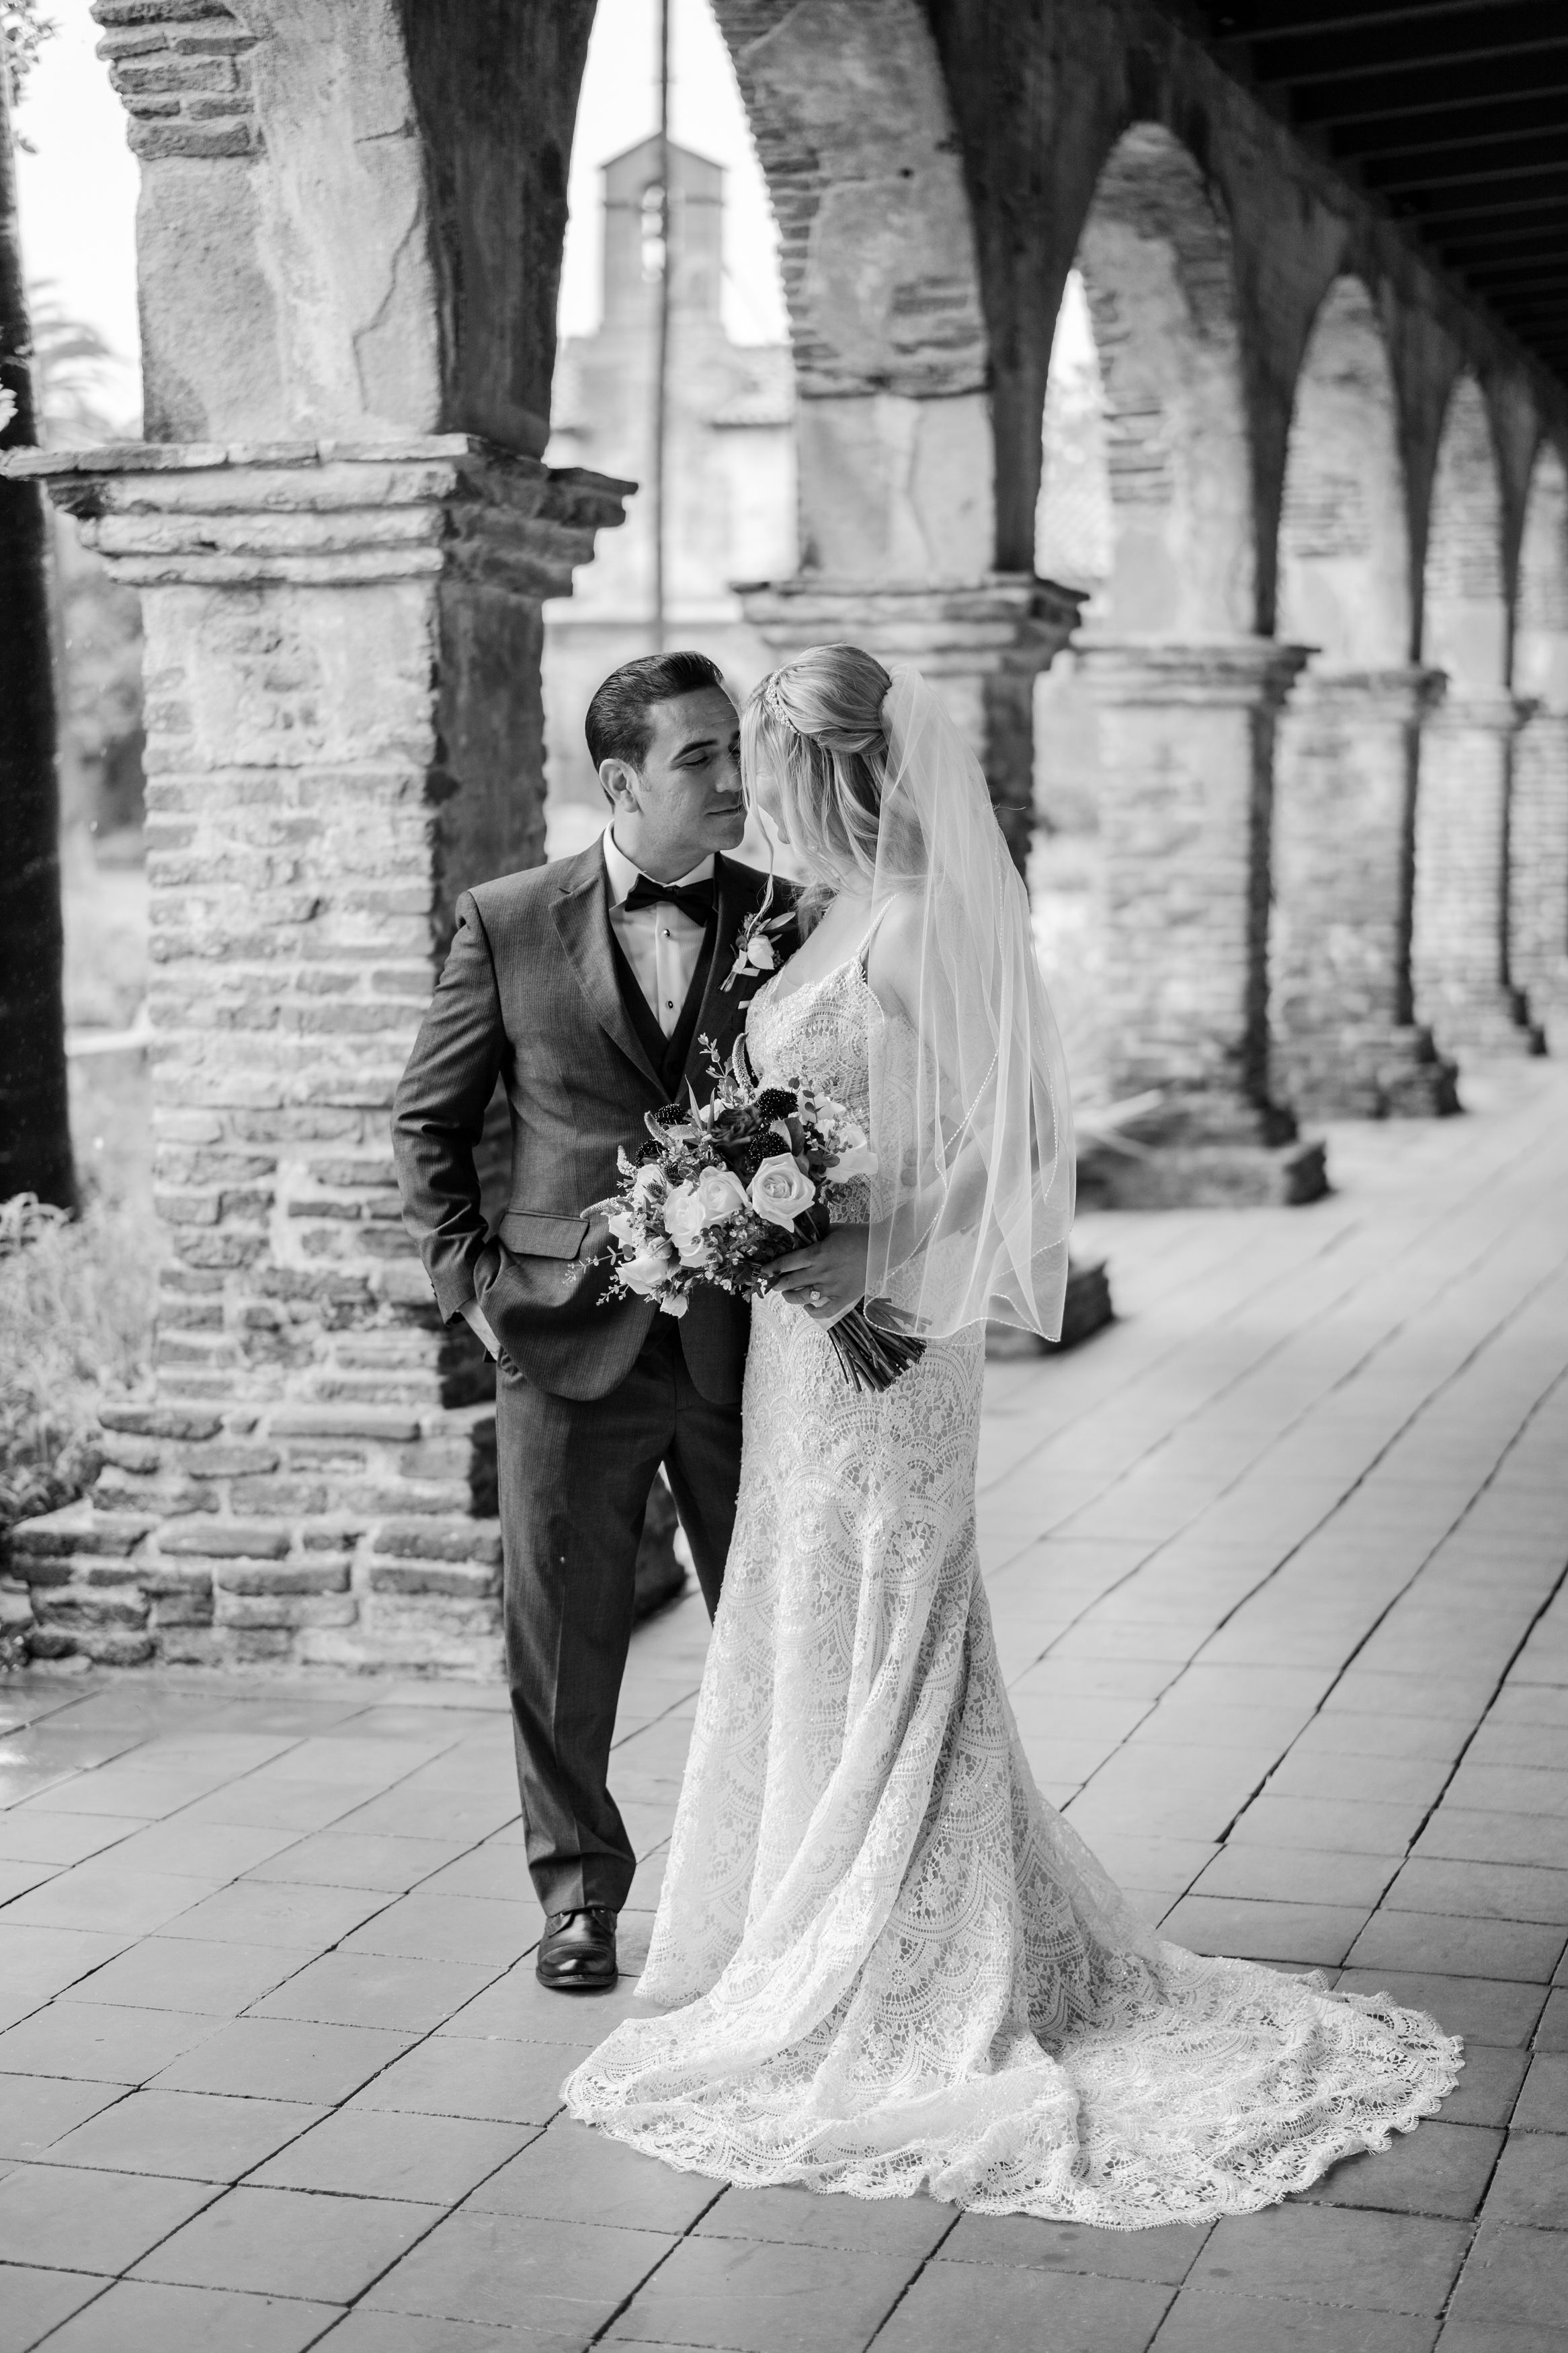 Michelle+Chris_Married_3.2.19_T58.jpg